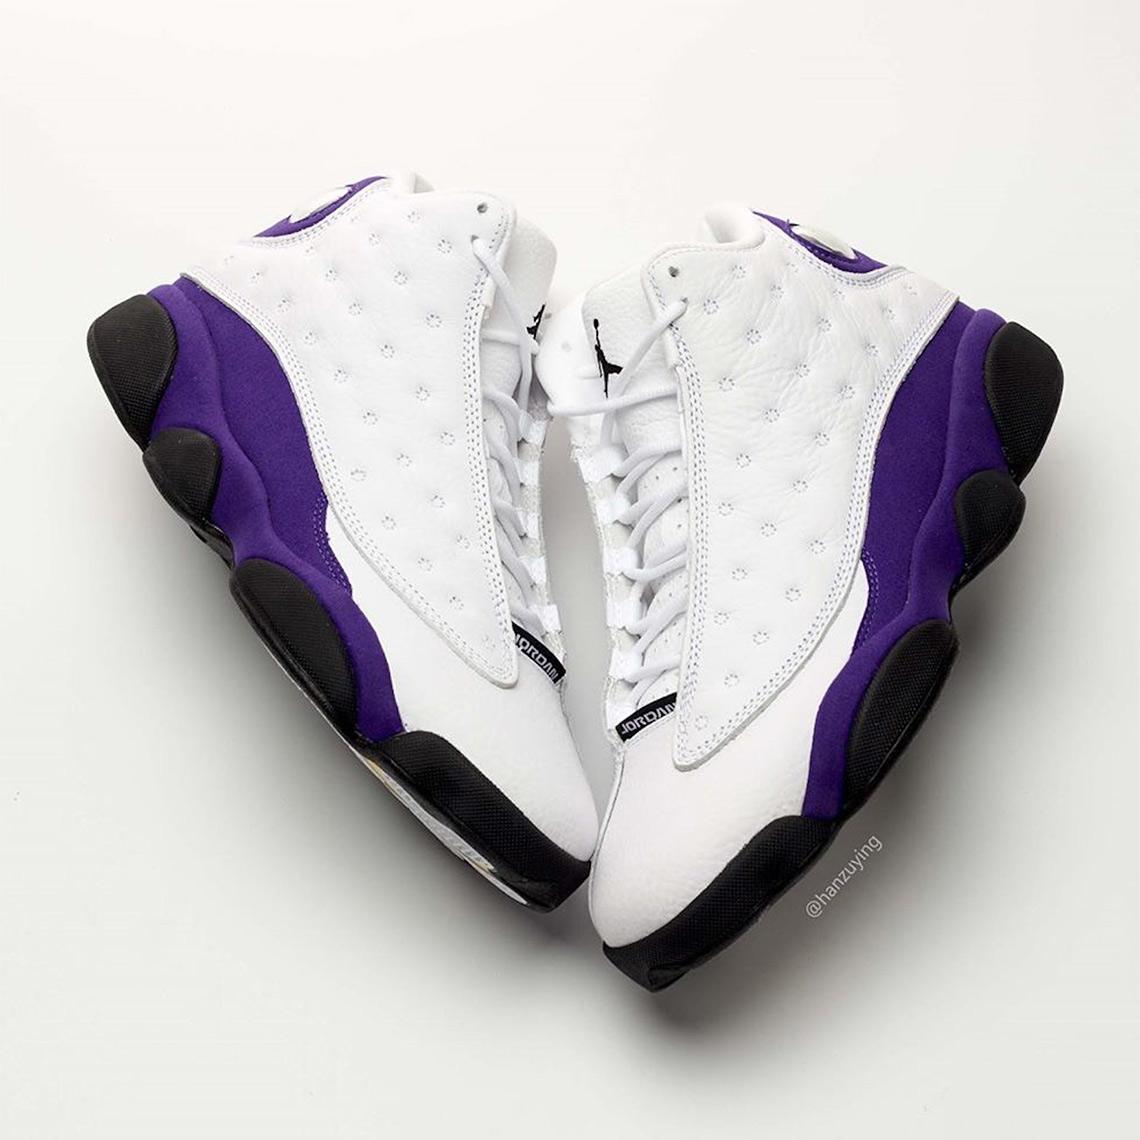 baf9e63a278 Air Jordan 13 Retro Release Date: July 20th, 2019 $190. Color: White/Black-Court  Purple-University Gold Style Code: 414571-105. Advertisement. Advertisement